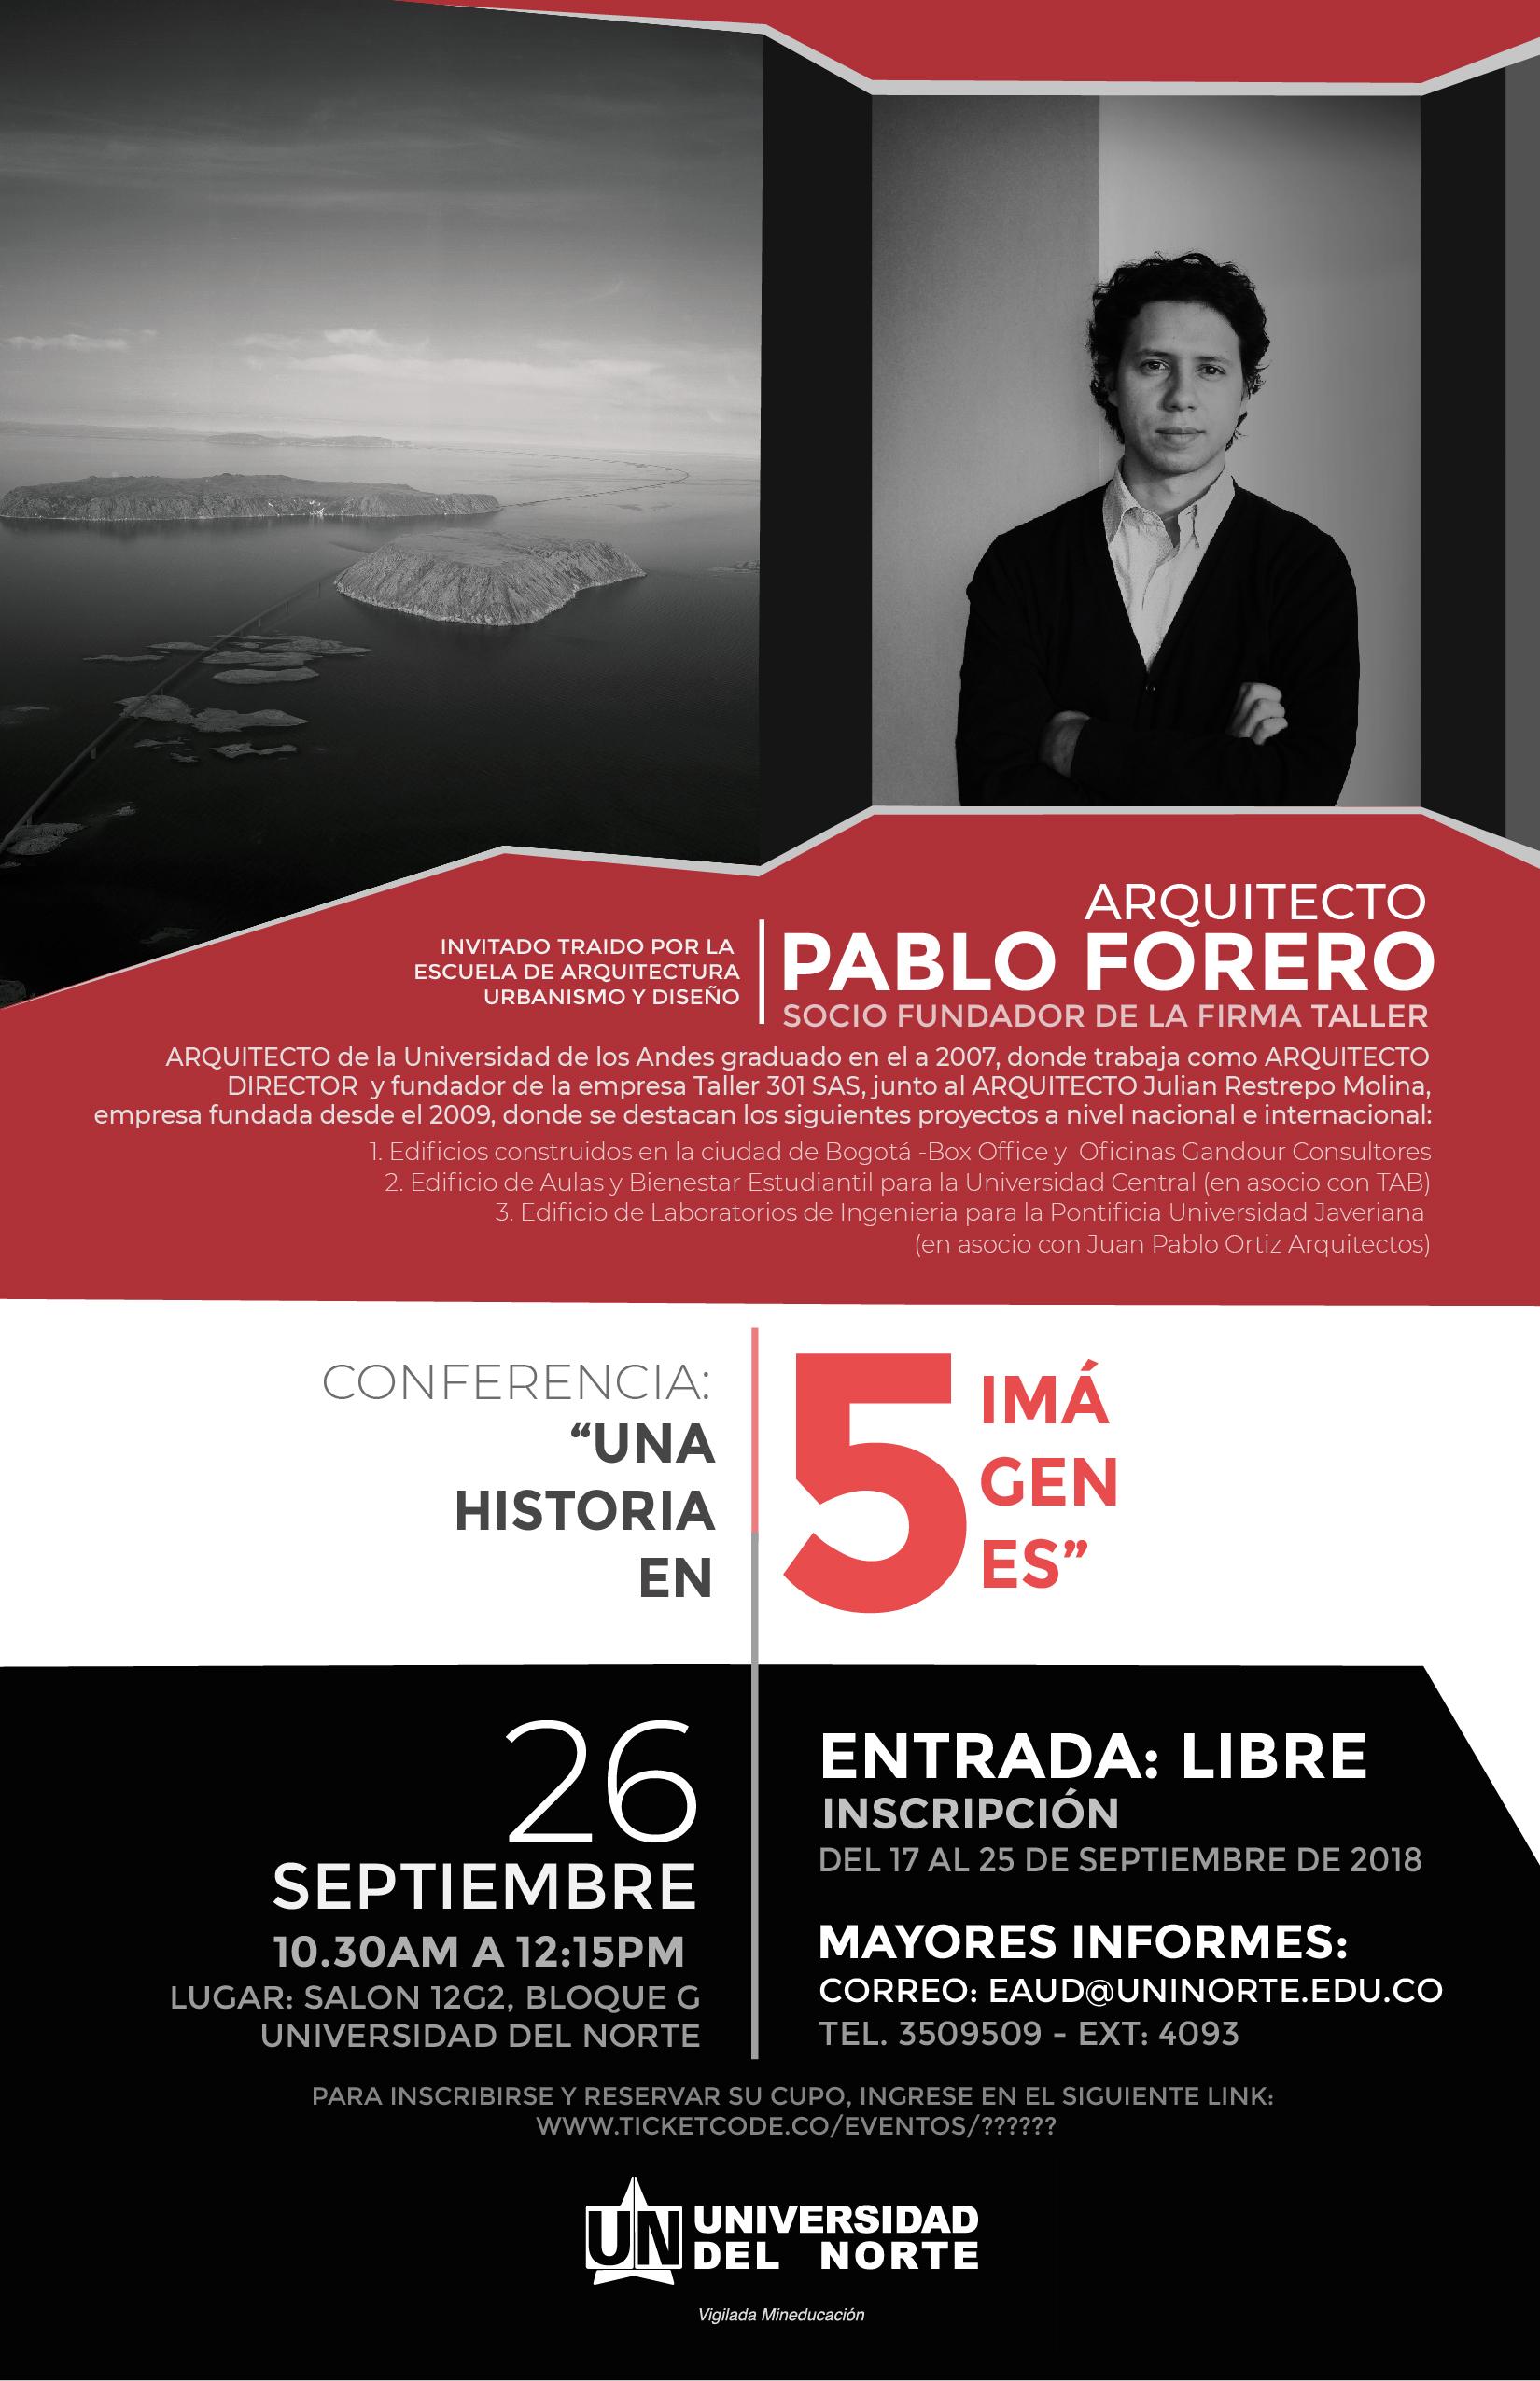 Poster_pablo_forero_-_final-01